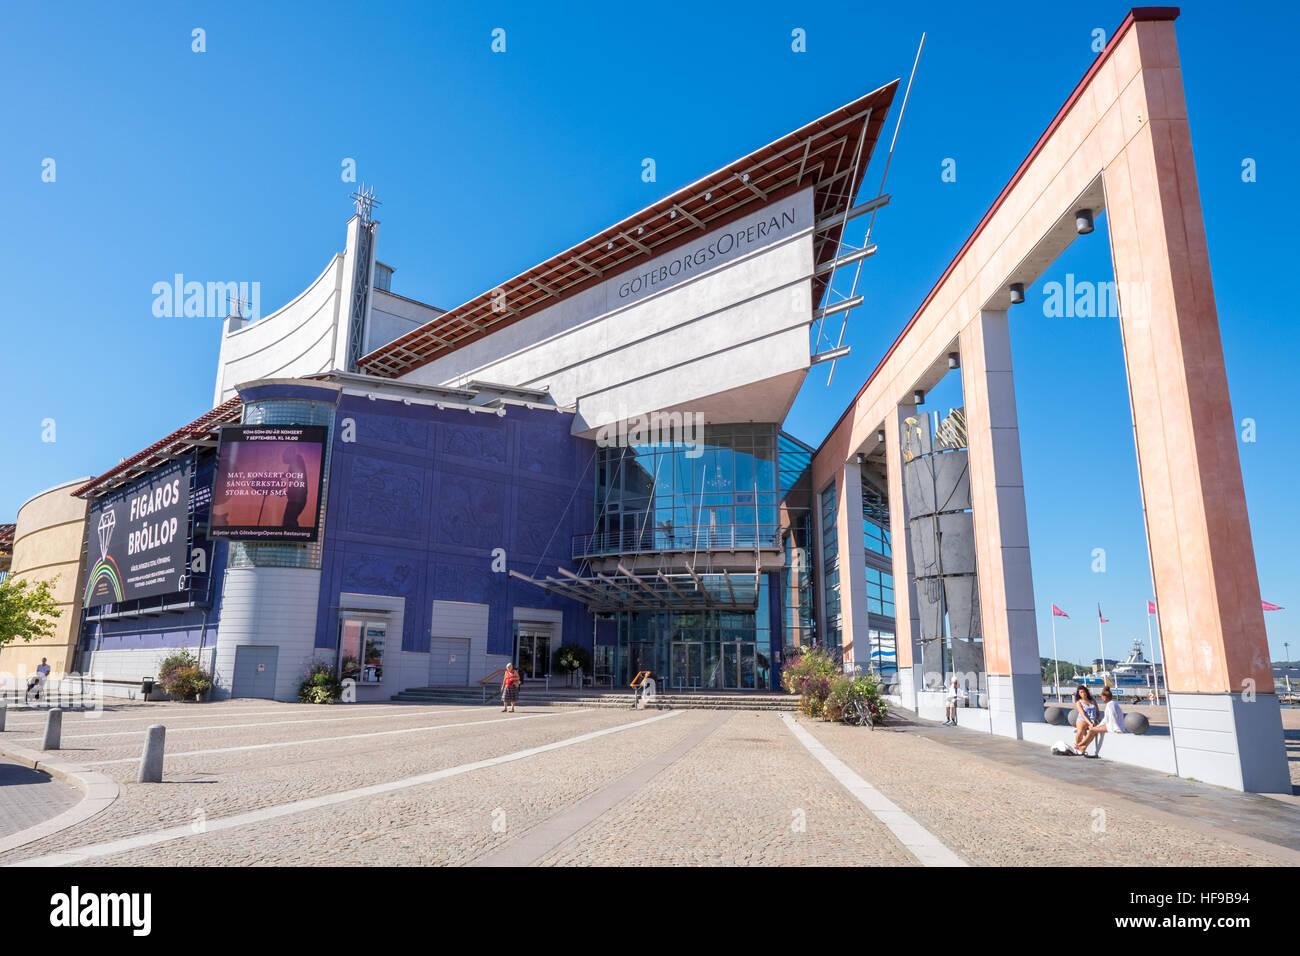 89555e7e6666 The Gothenburg Opera House in Gothenburg harbor Stock Photo ...